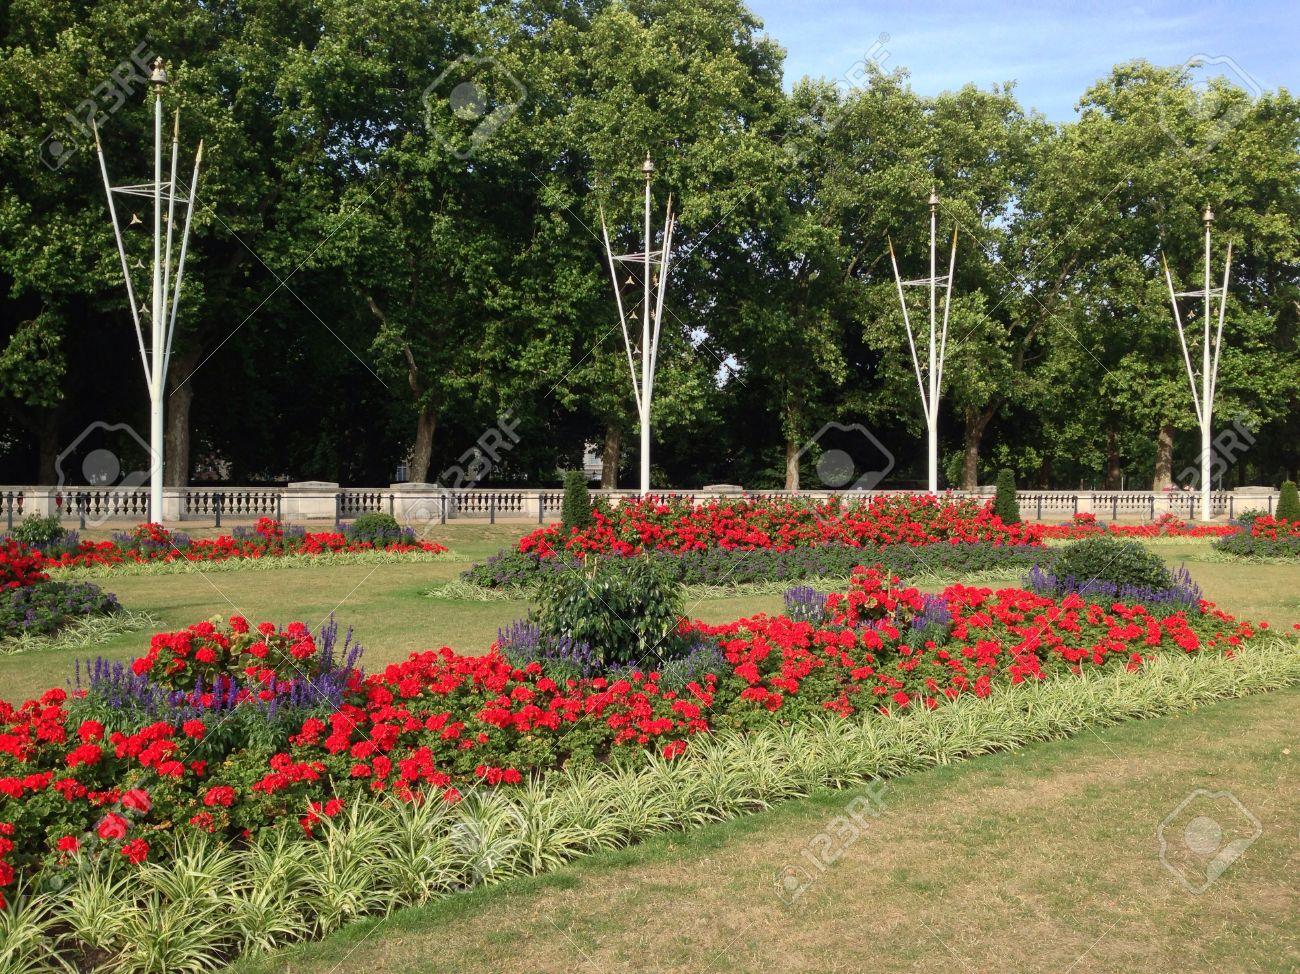 hermosos jardines flores rojas calientes londres foto de archivo